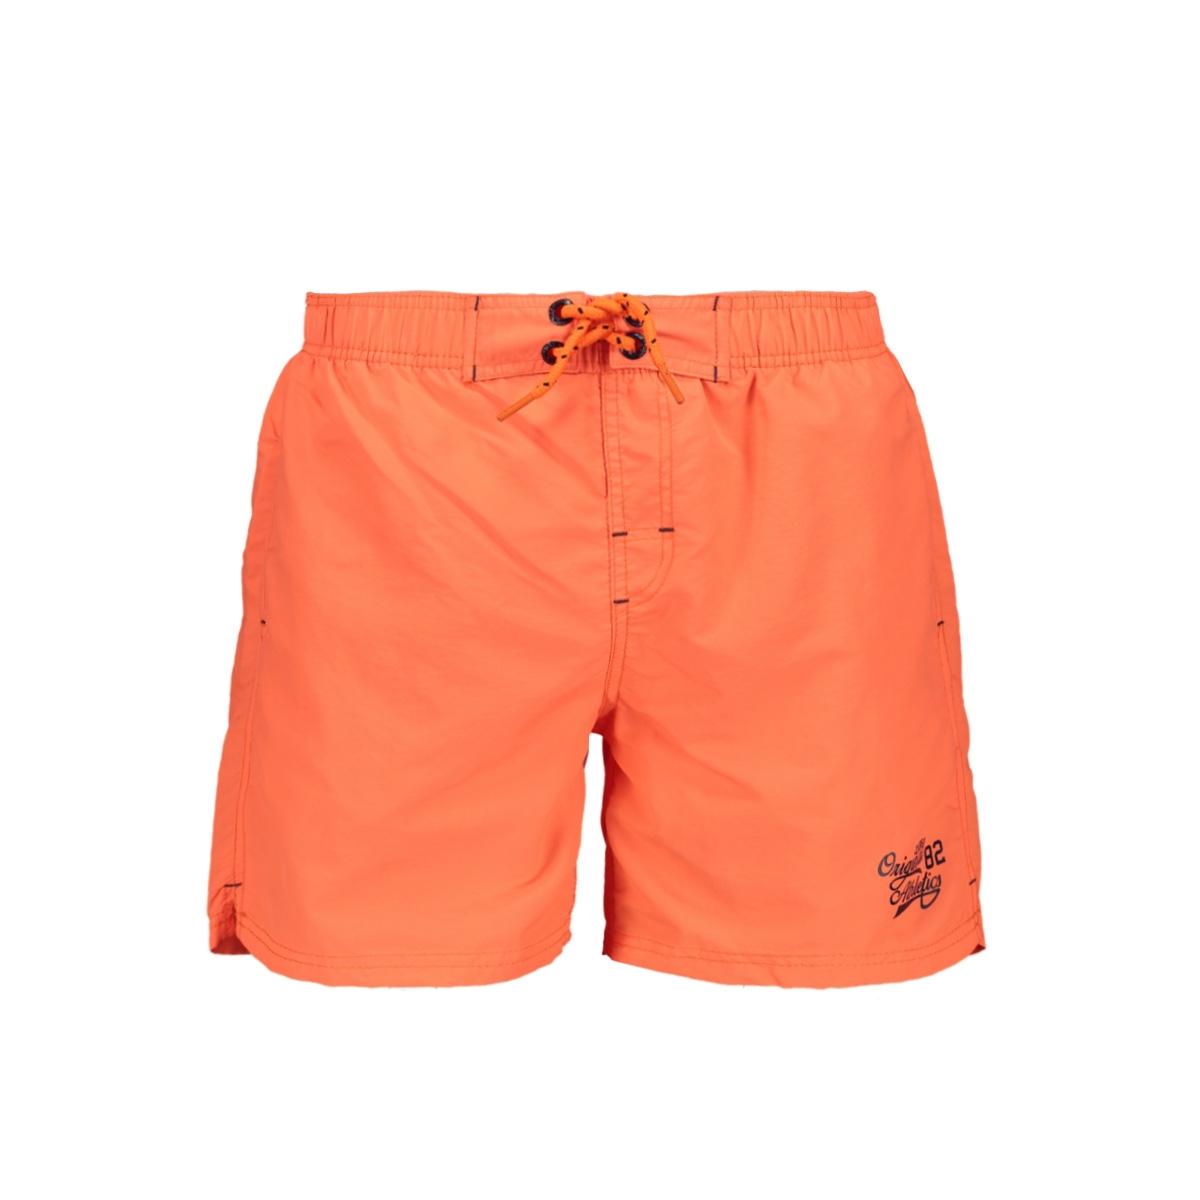 sassari 4305532 cars korte broek neon orange